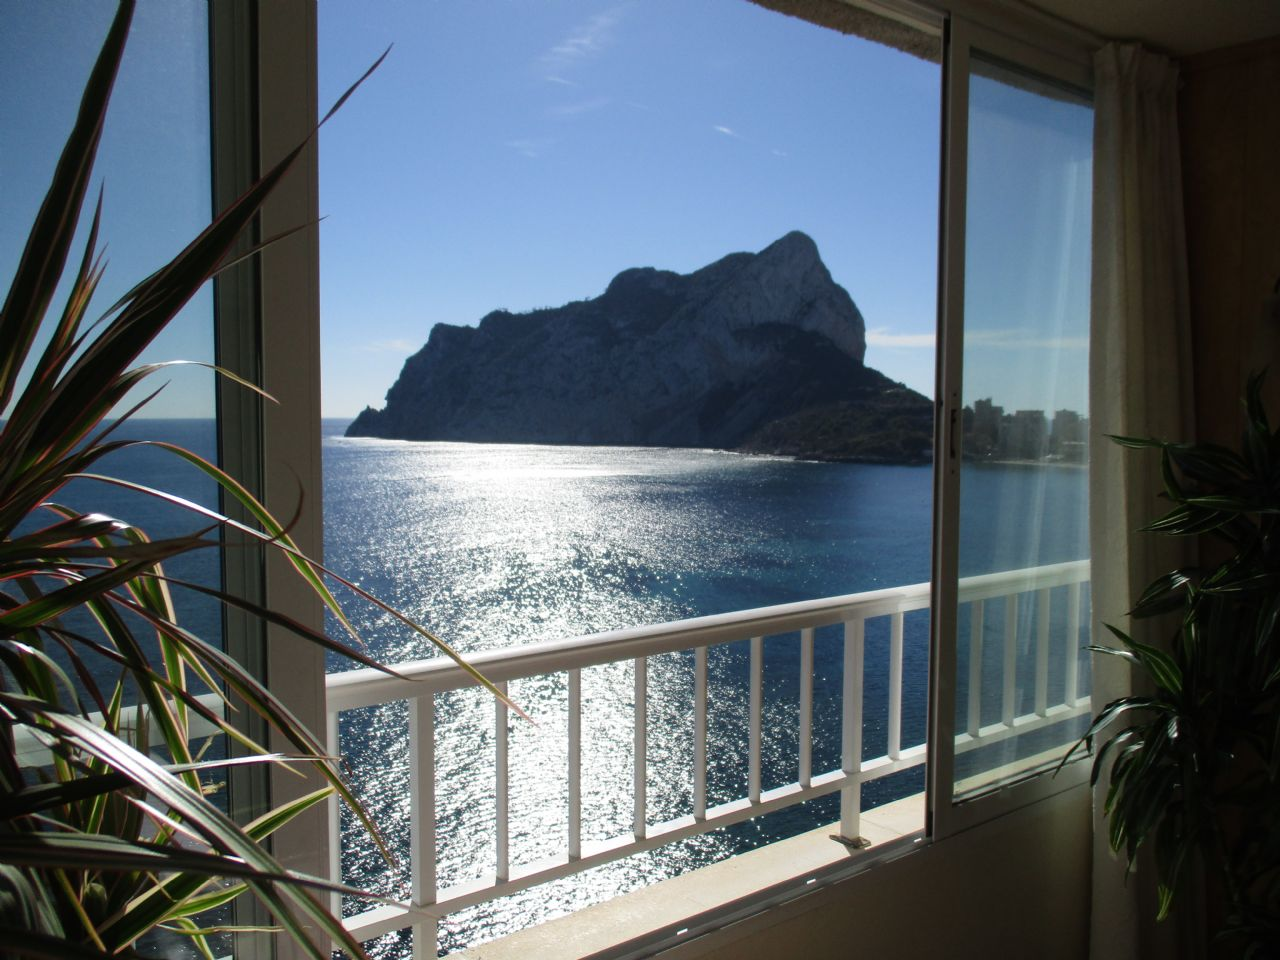 Ático en Calp / Calpe, Playa Levante, venta